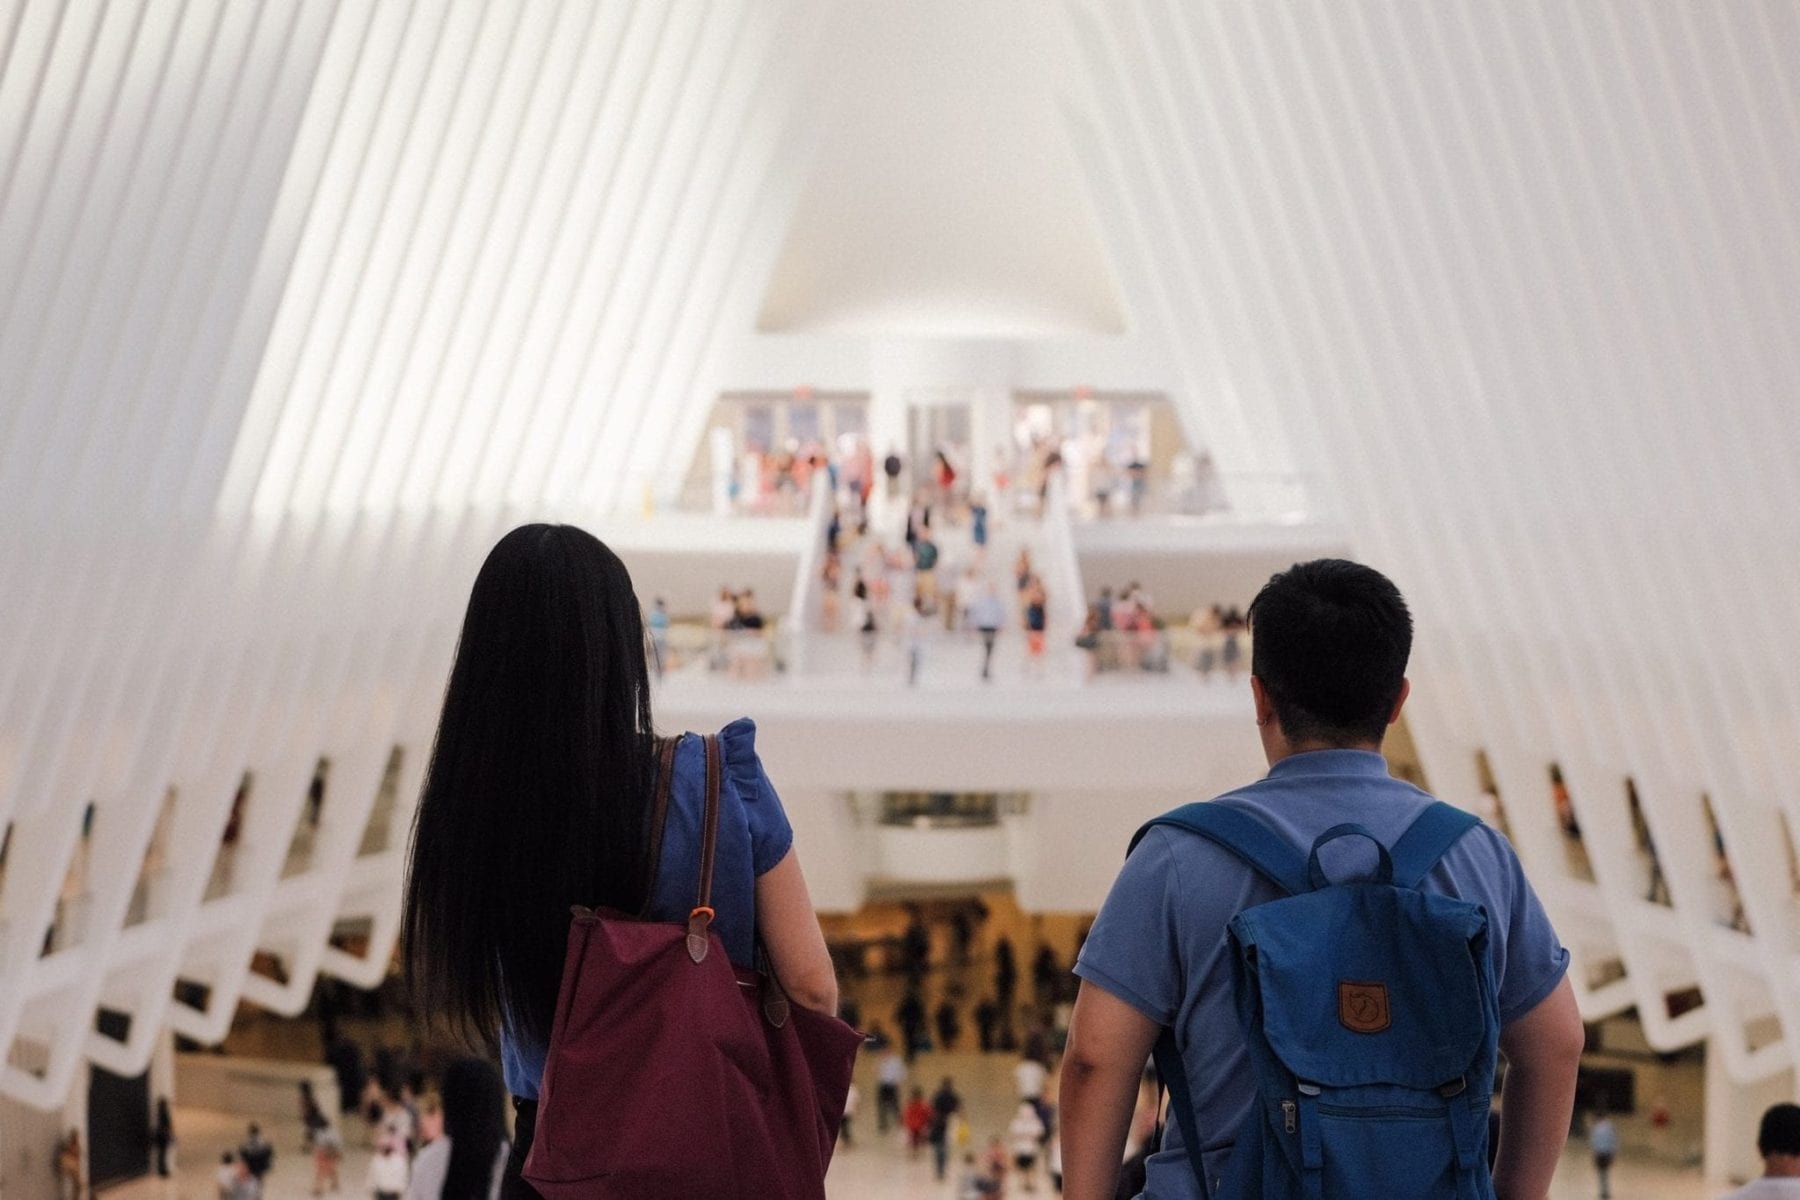 NYC Oculus WTC8